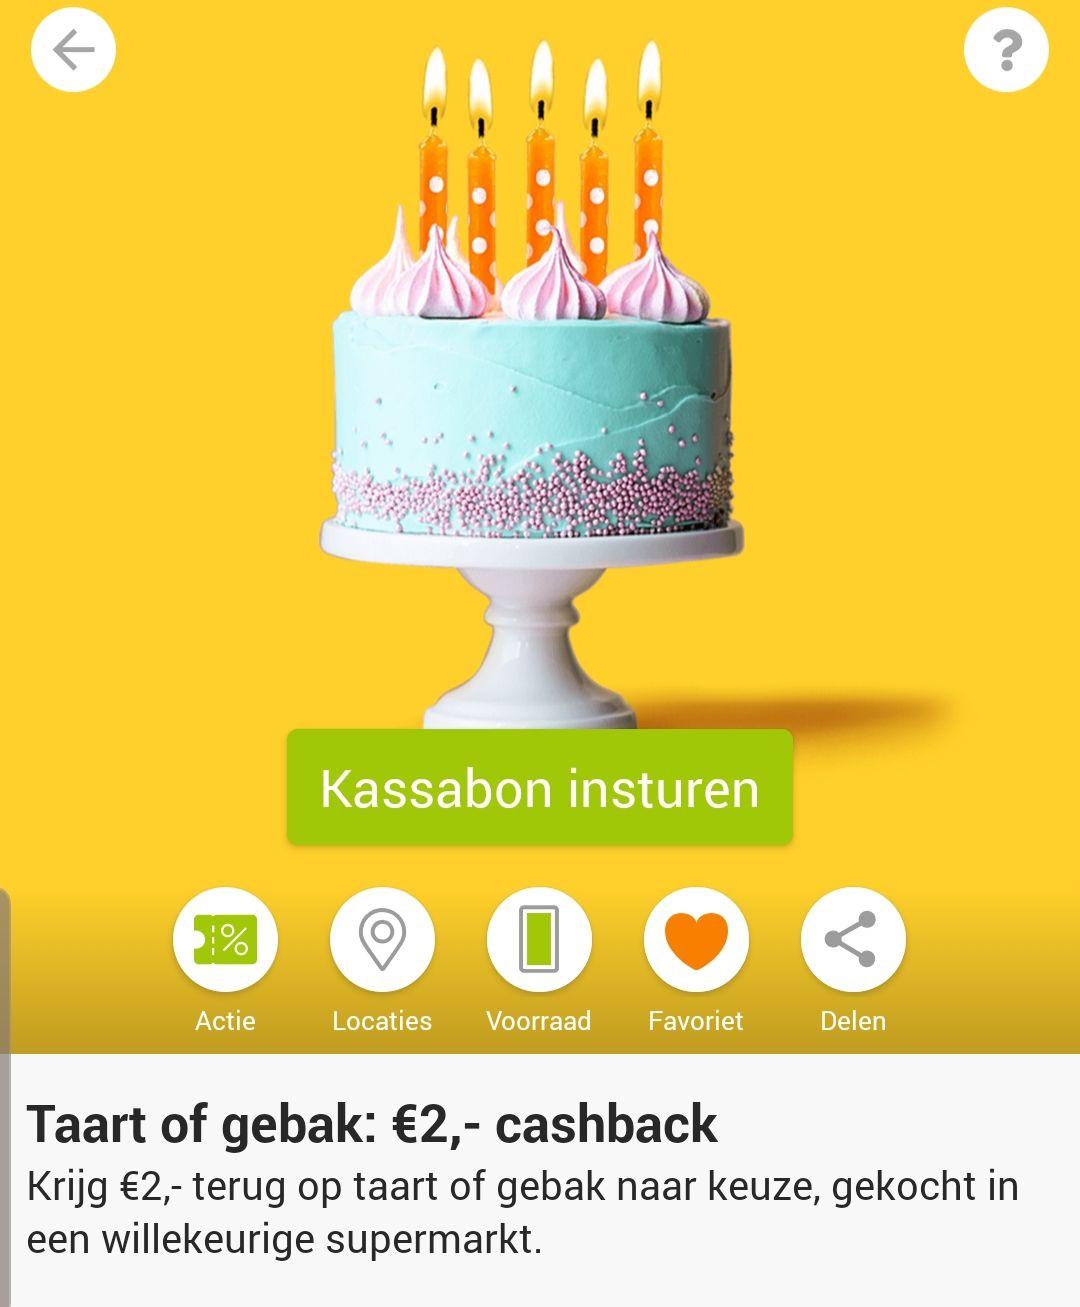 € 2,- cashback op taart en gebak